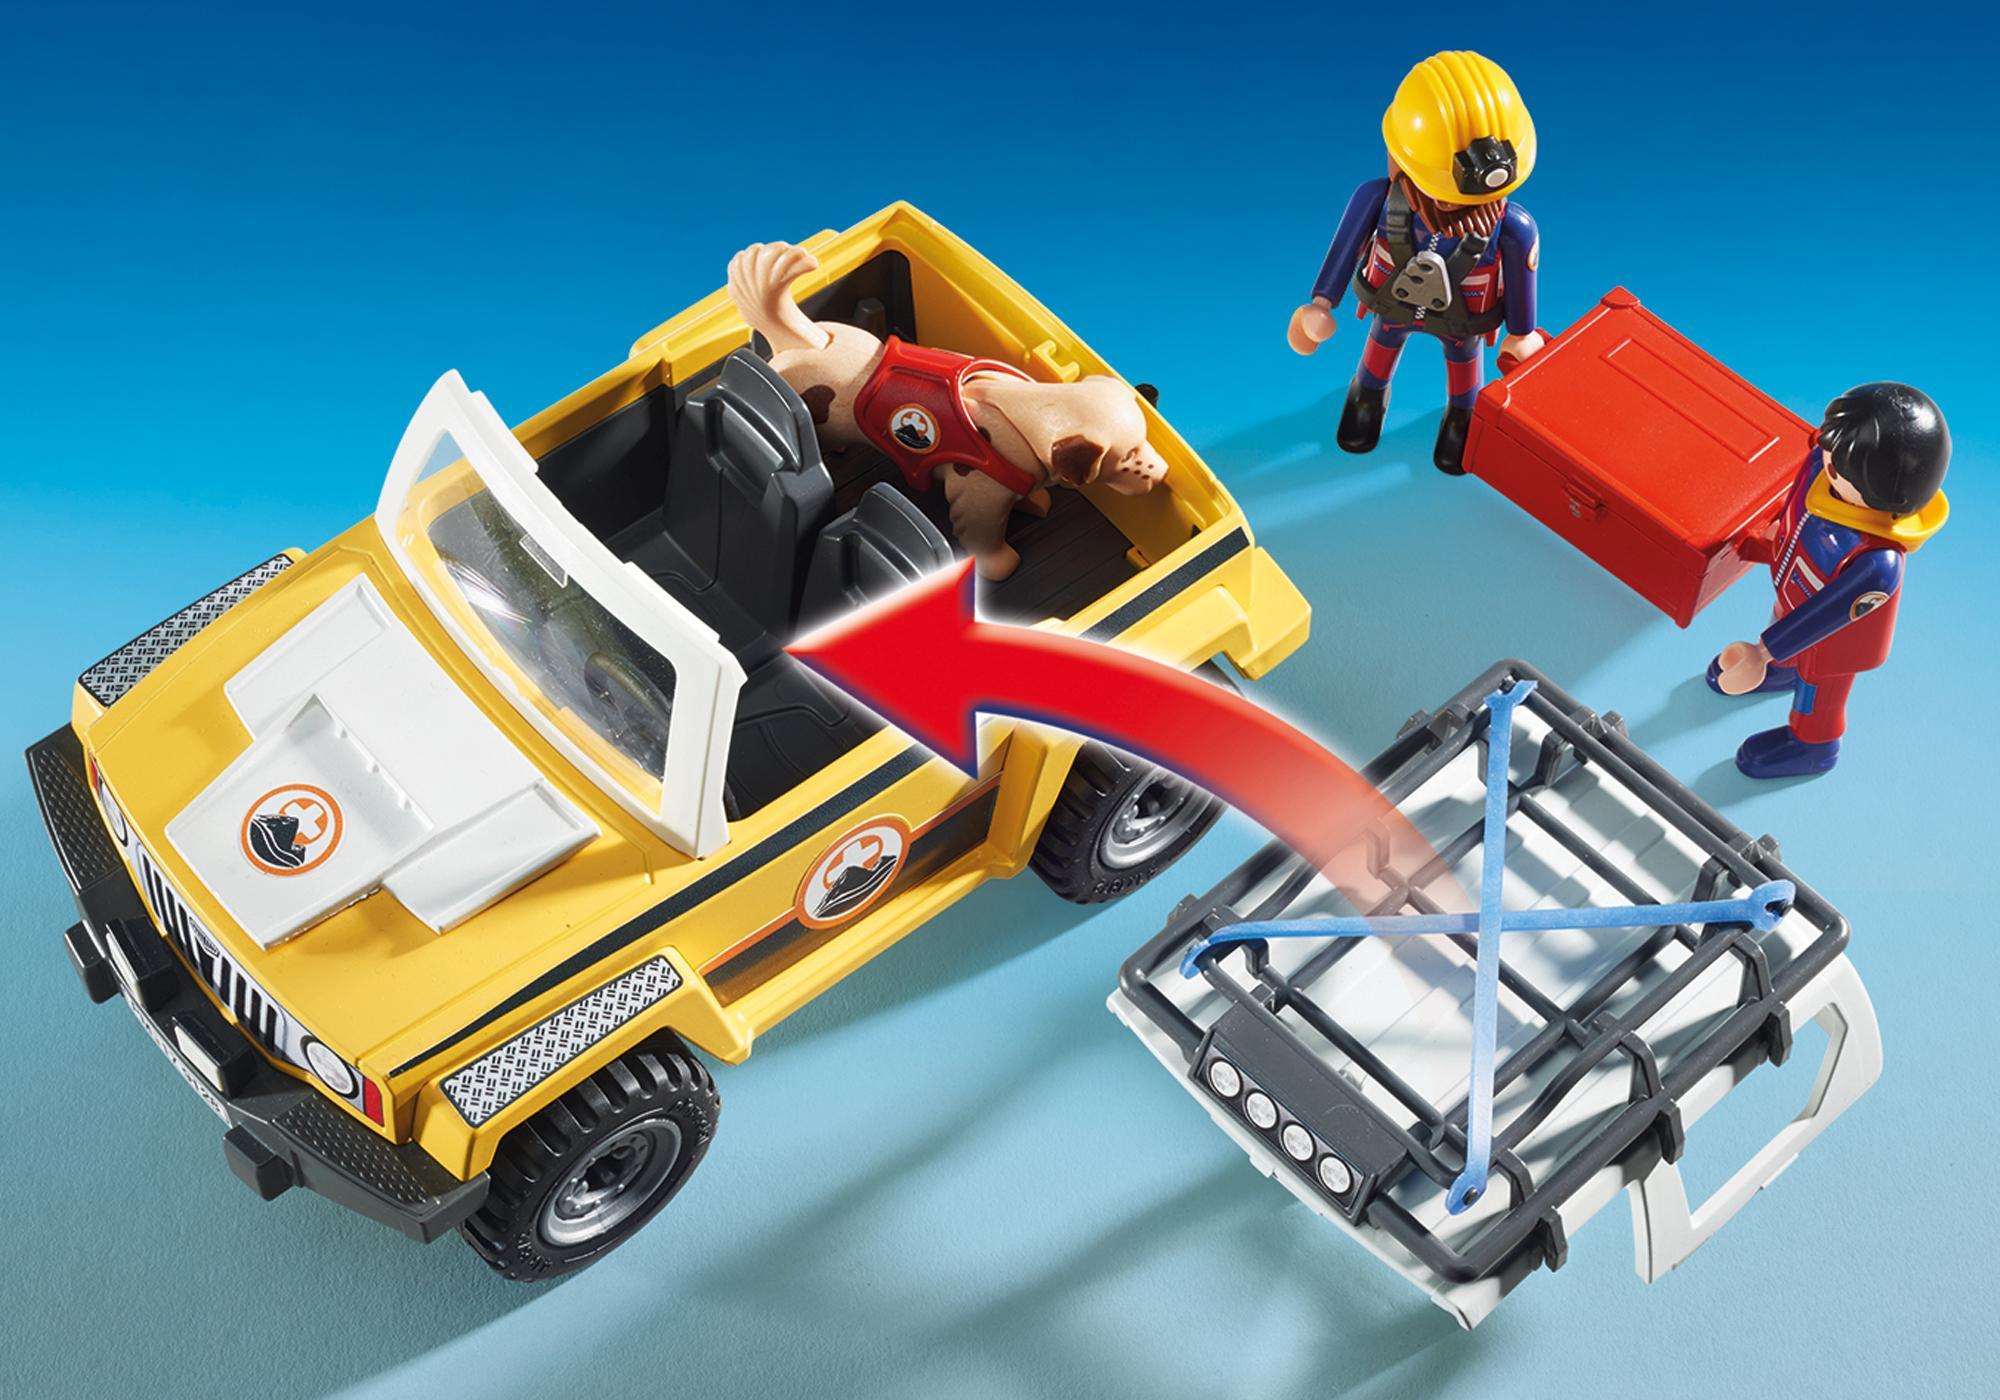 http://media.playmobil.com/i/playmobil/9128_product_extra3/Bergretter-Einsatzfahrzeug